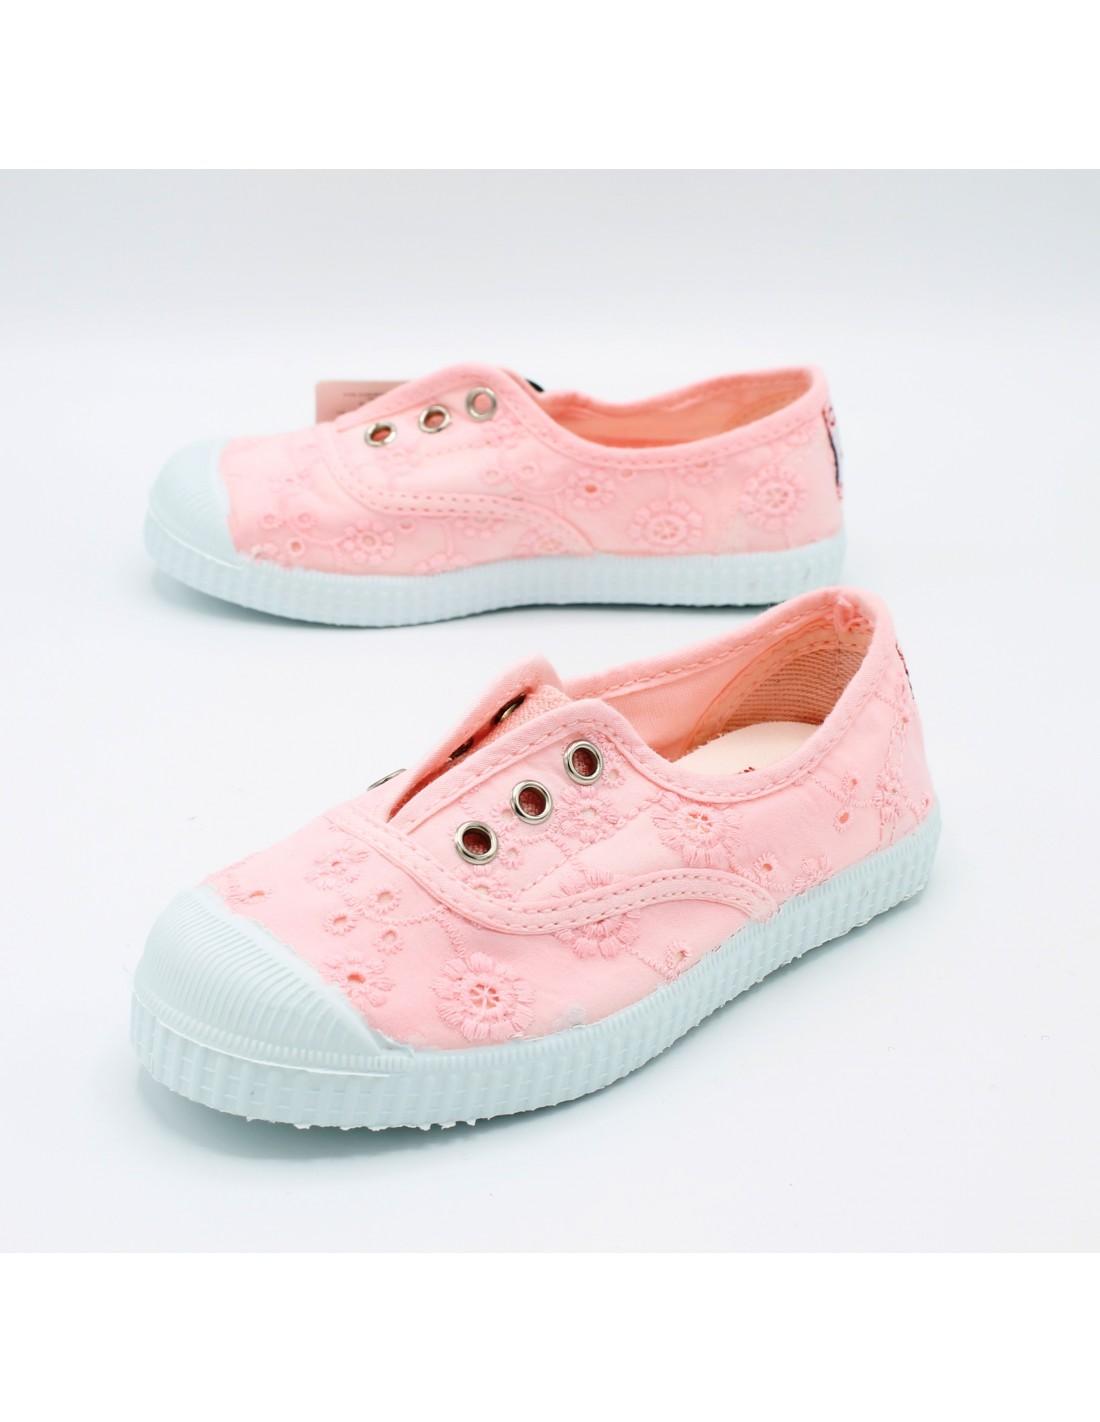 Cienta Scarpe da Bambina Ragazza Sneakers per Bimbe Estive Tennis Bimba 27 28 31